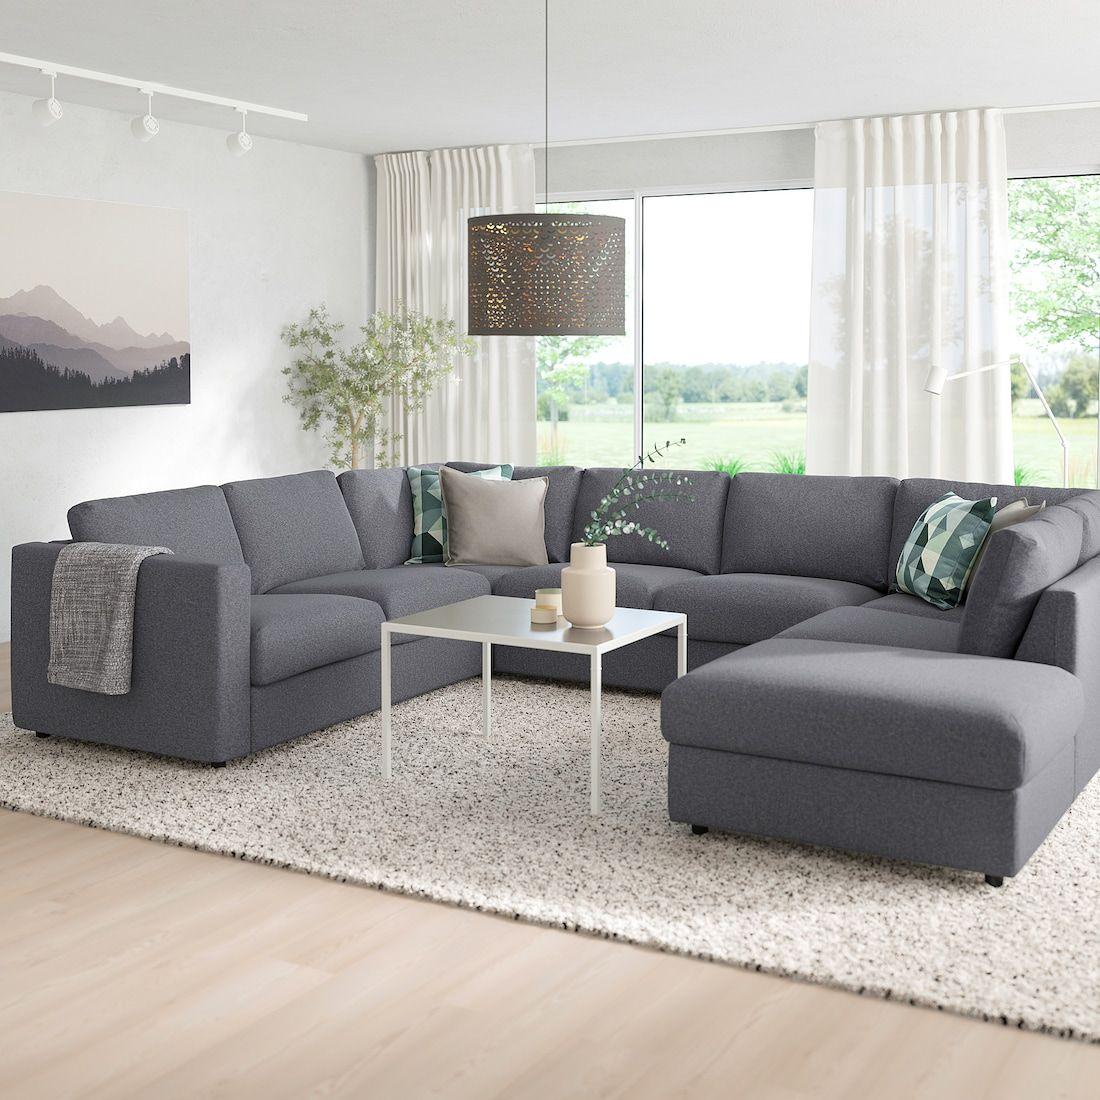 Vimle Sectional 6 Seat With Open End Gunnared Medium Gray Ikea U Shaped Sofa Ikea Sectional Sofa Corner Sofa